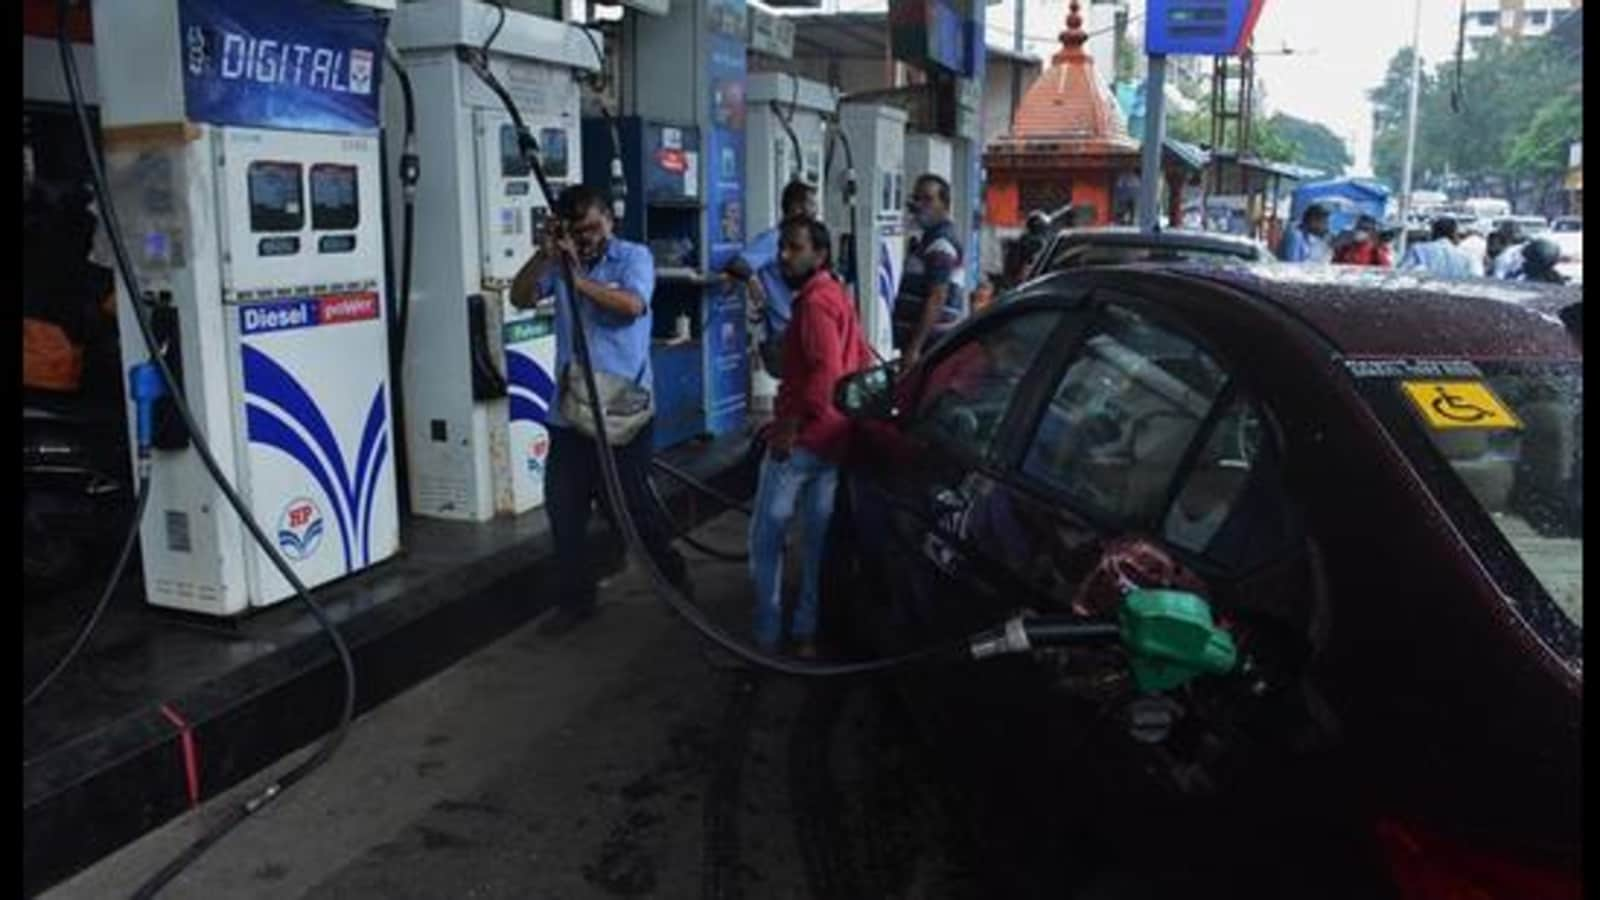 At ₹111.09, petrol price at all-time high in Mumbai